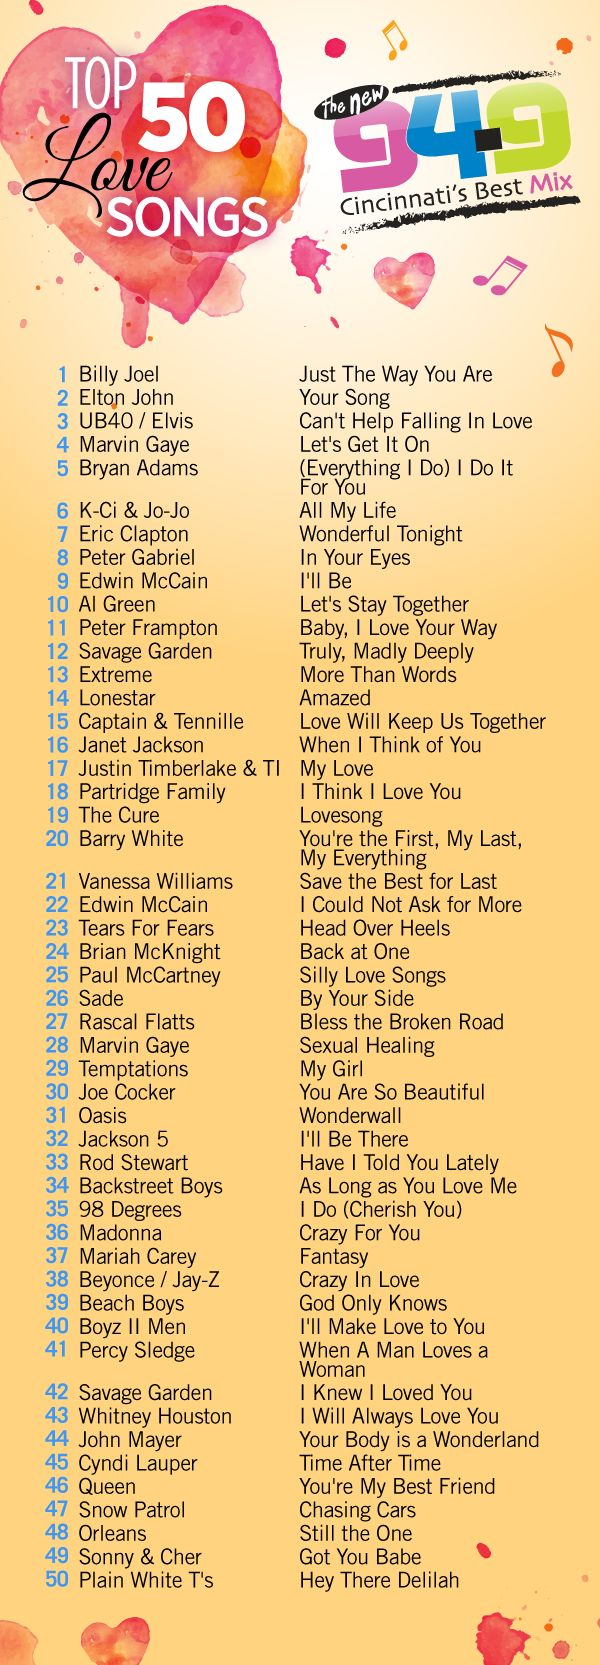 List of greatest love songs